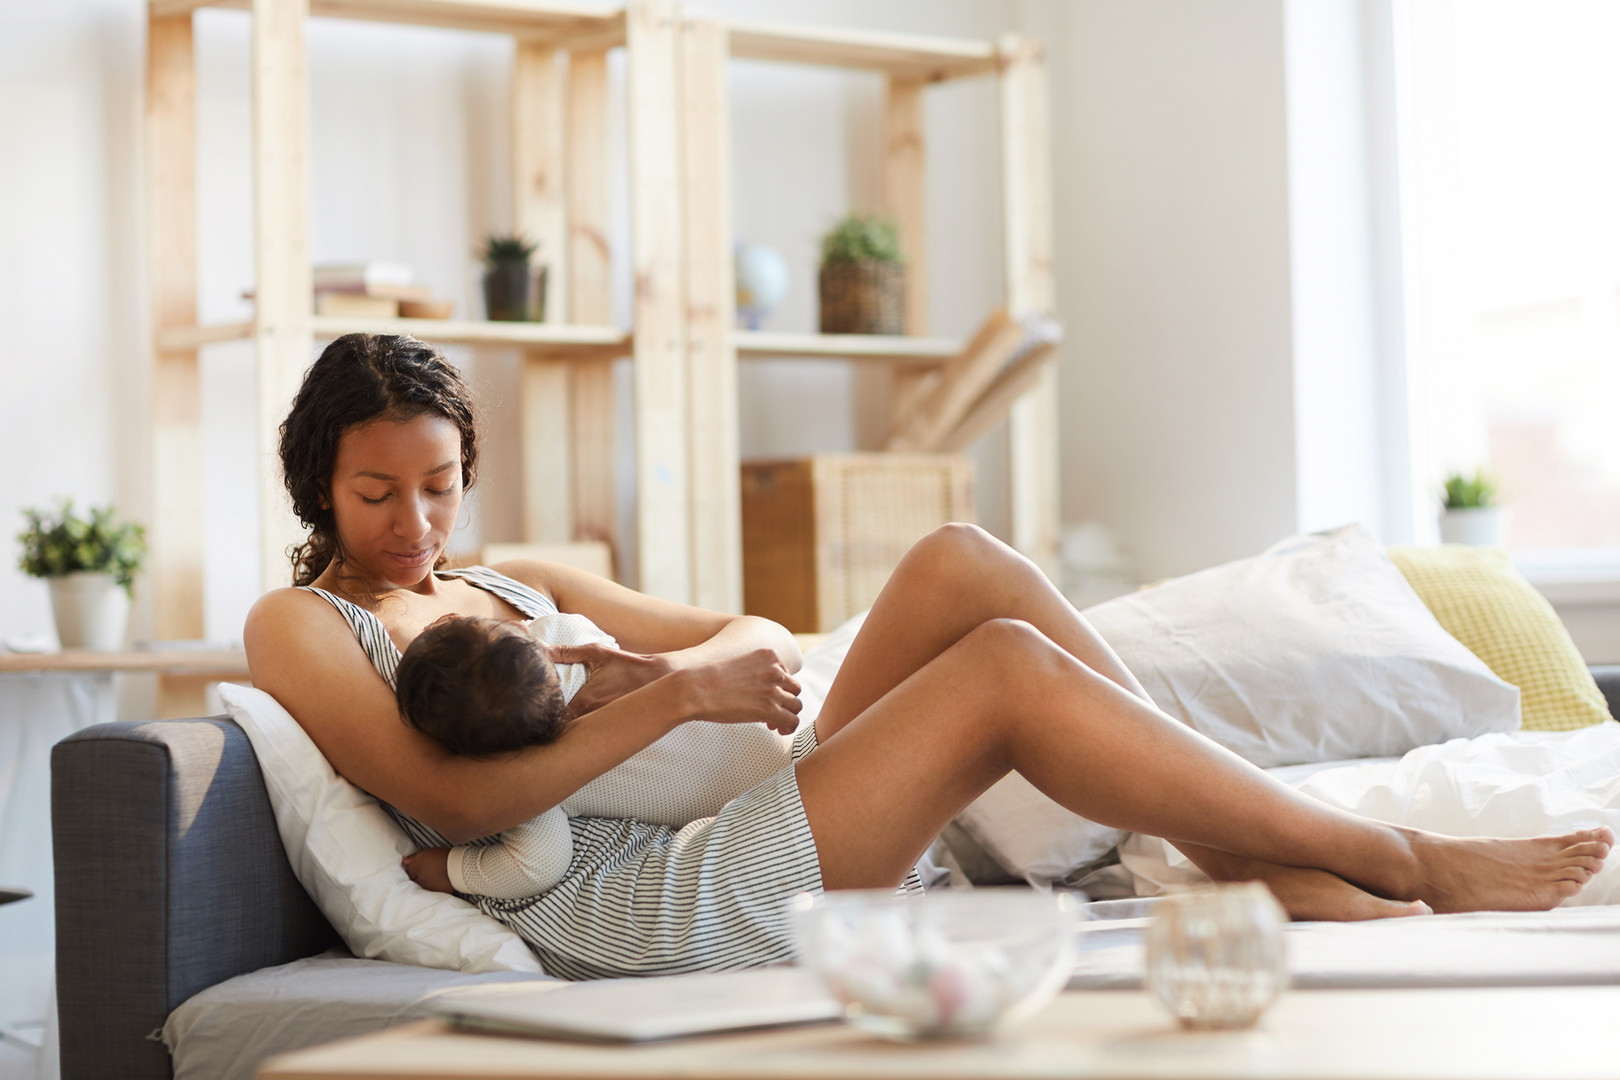 Breast/Chestfeeding Support